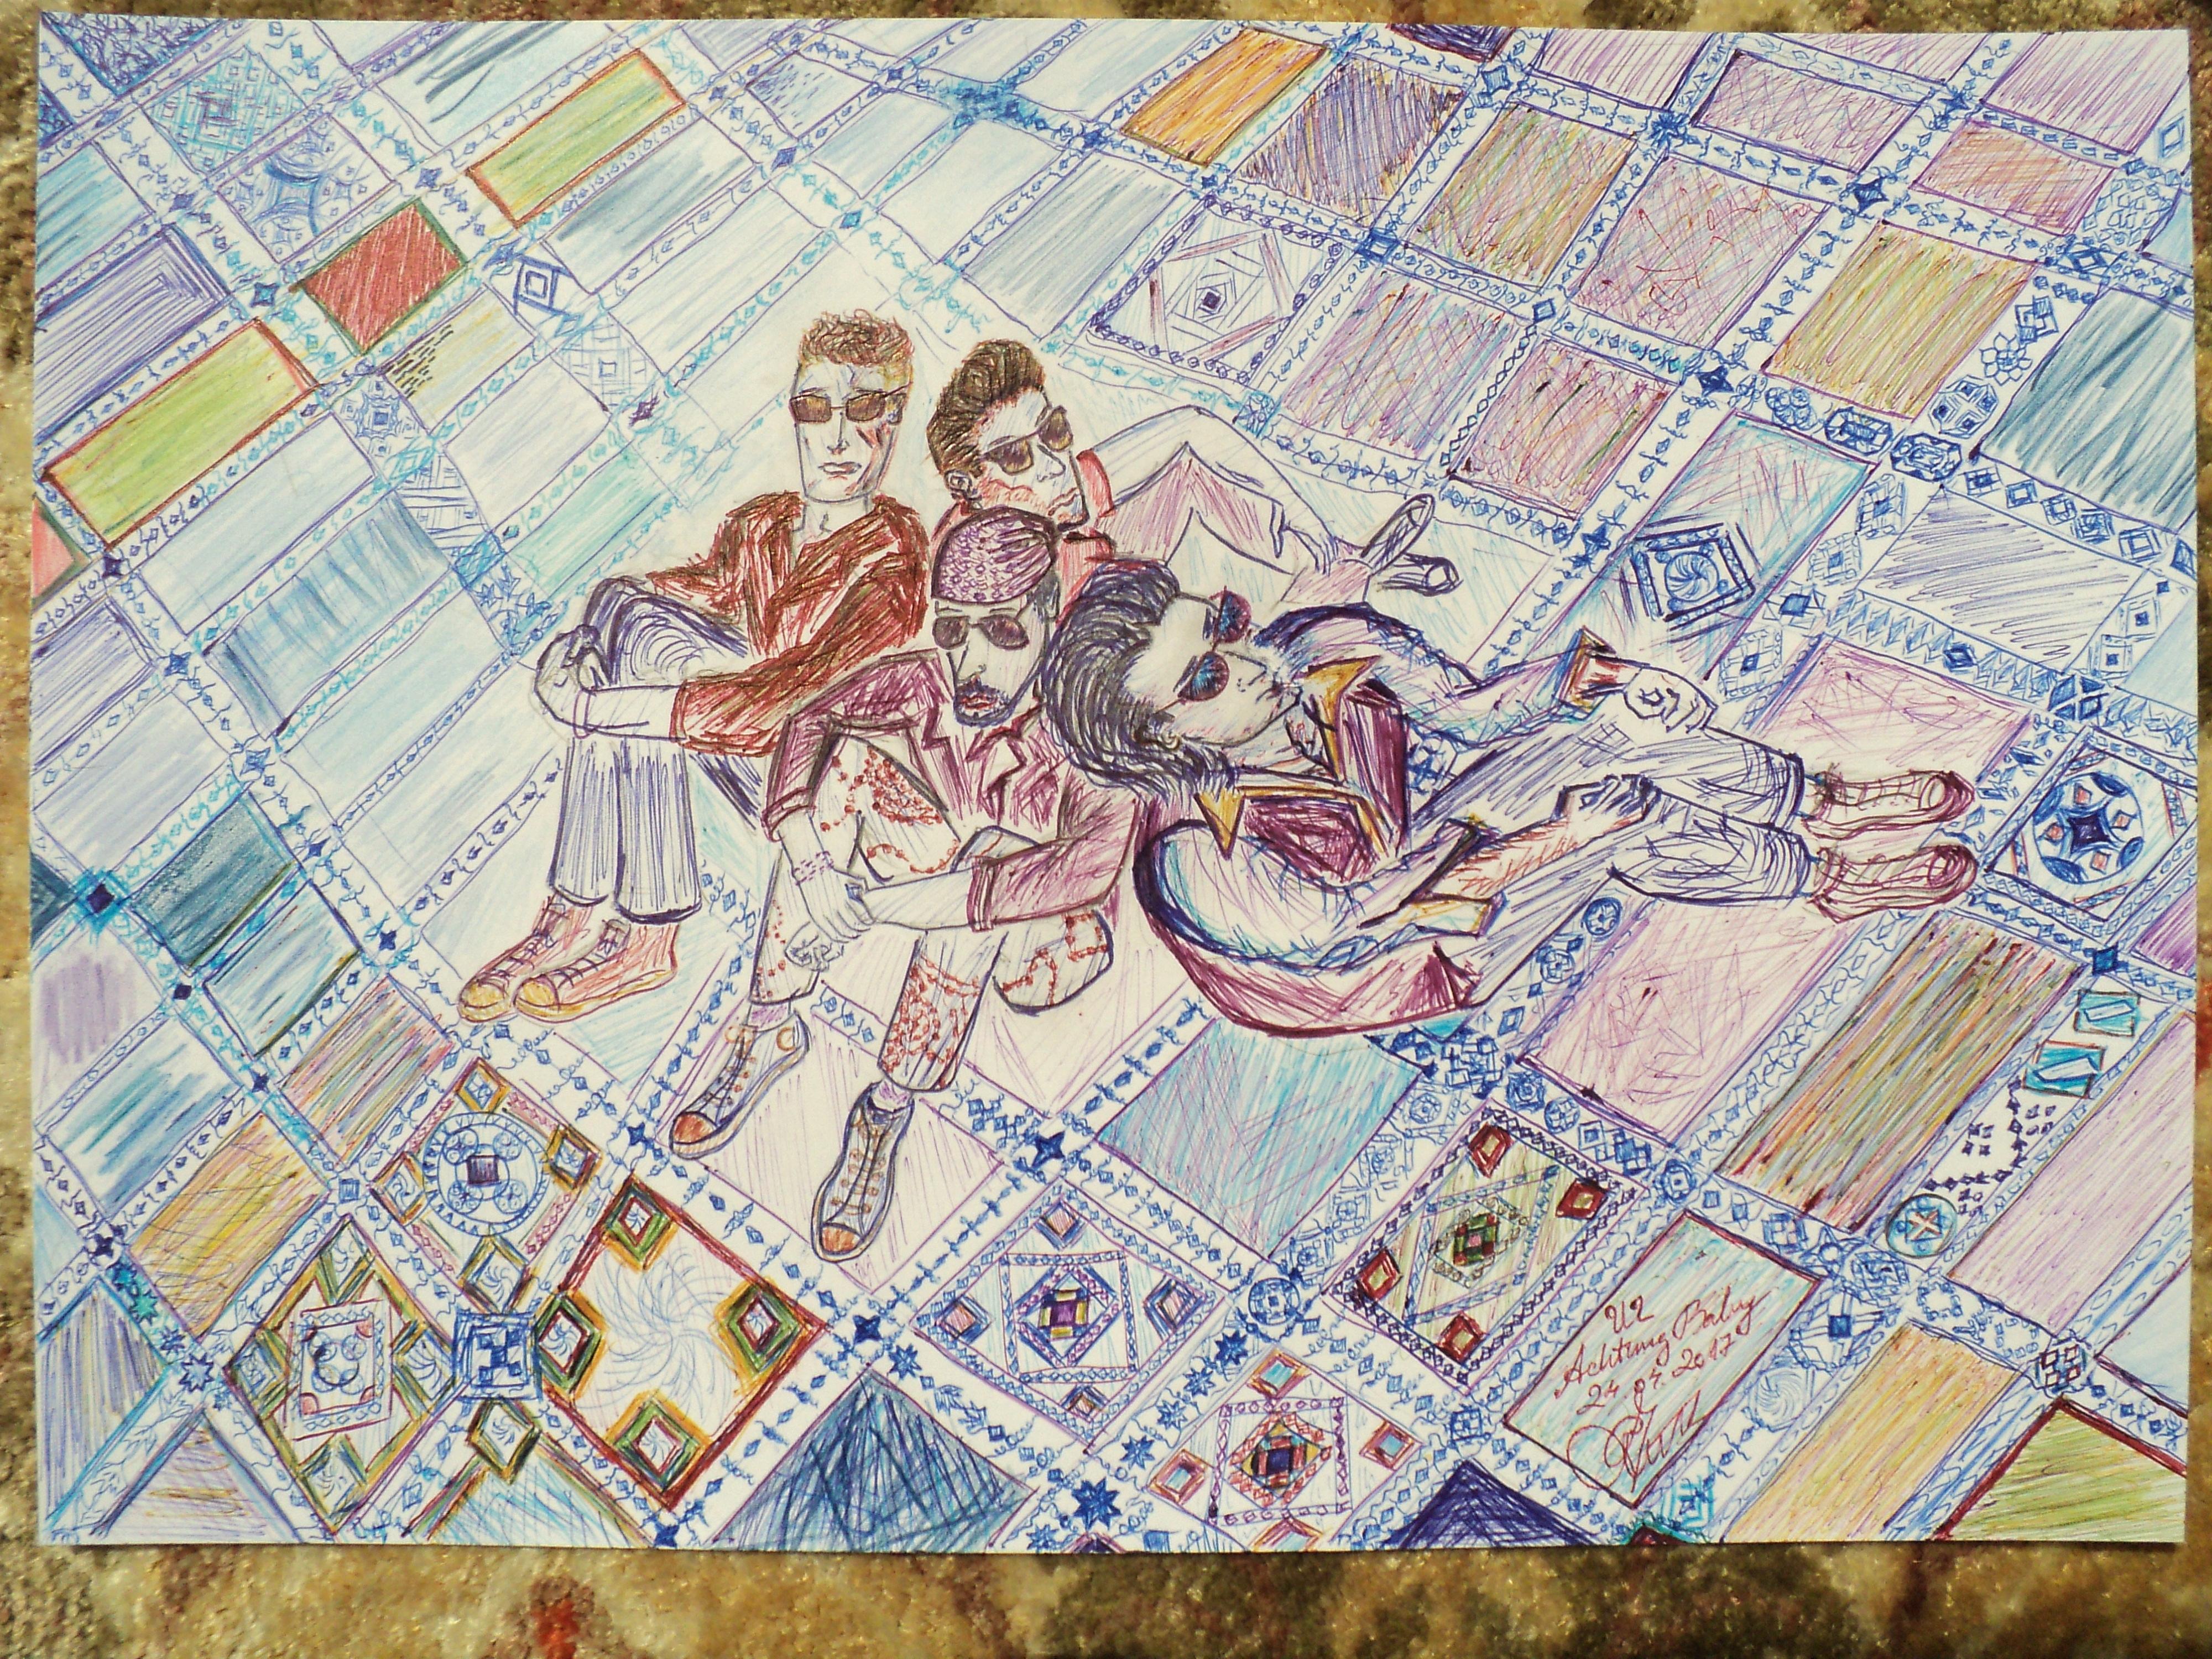 u2 achtung baby fan art by rainygreentrabant on deviantart